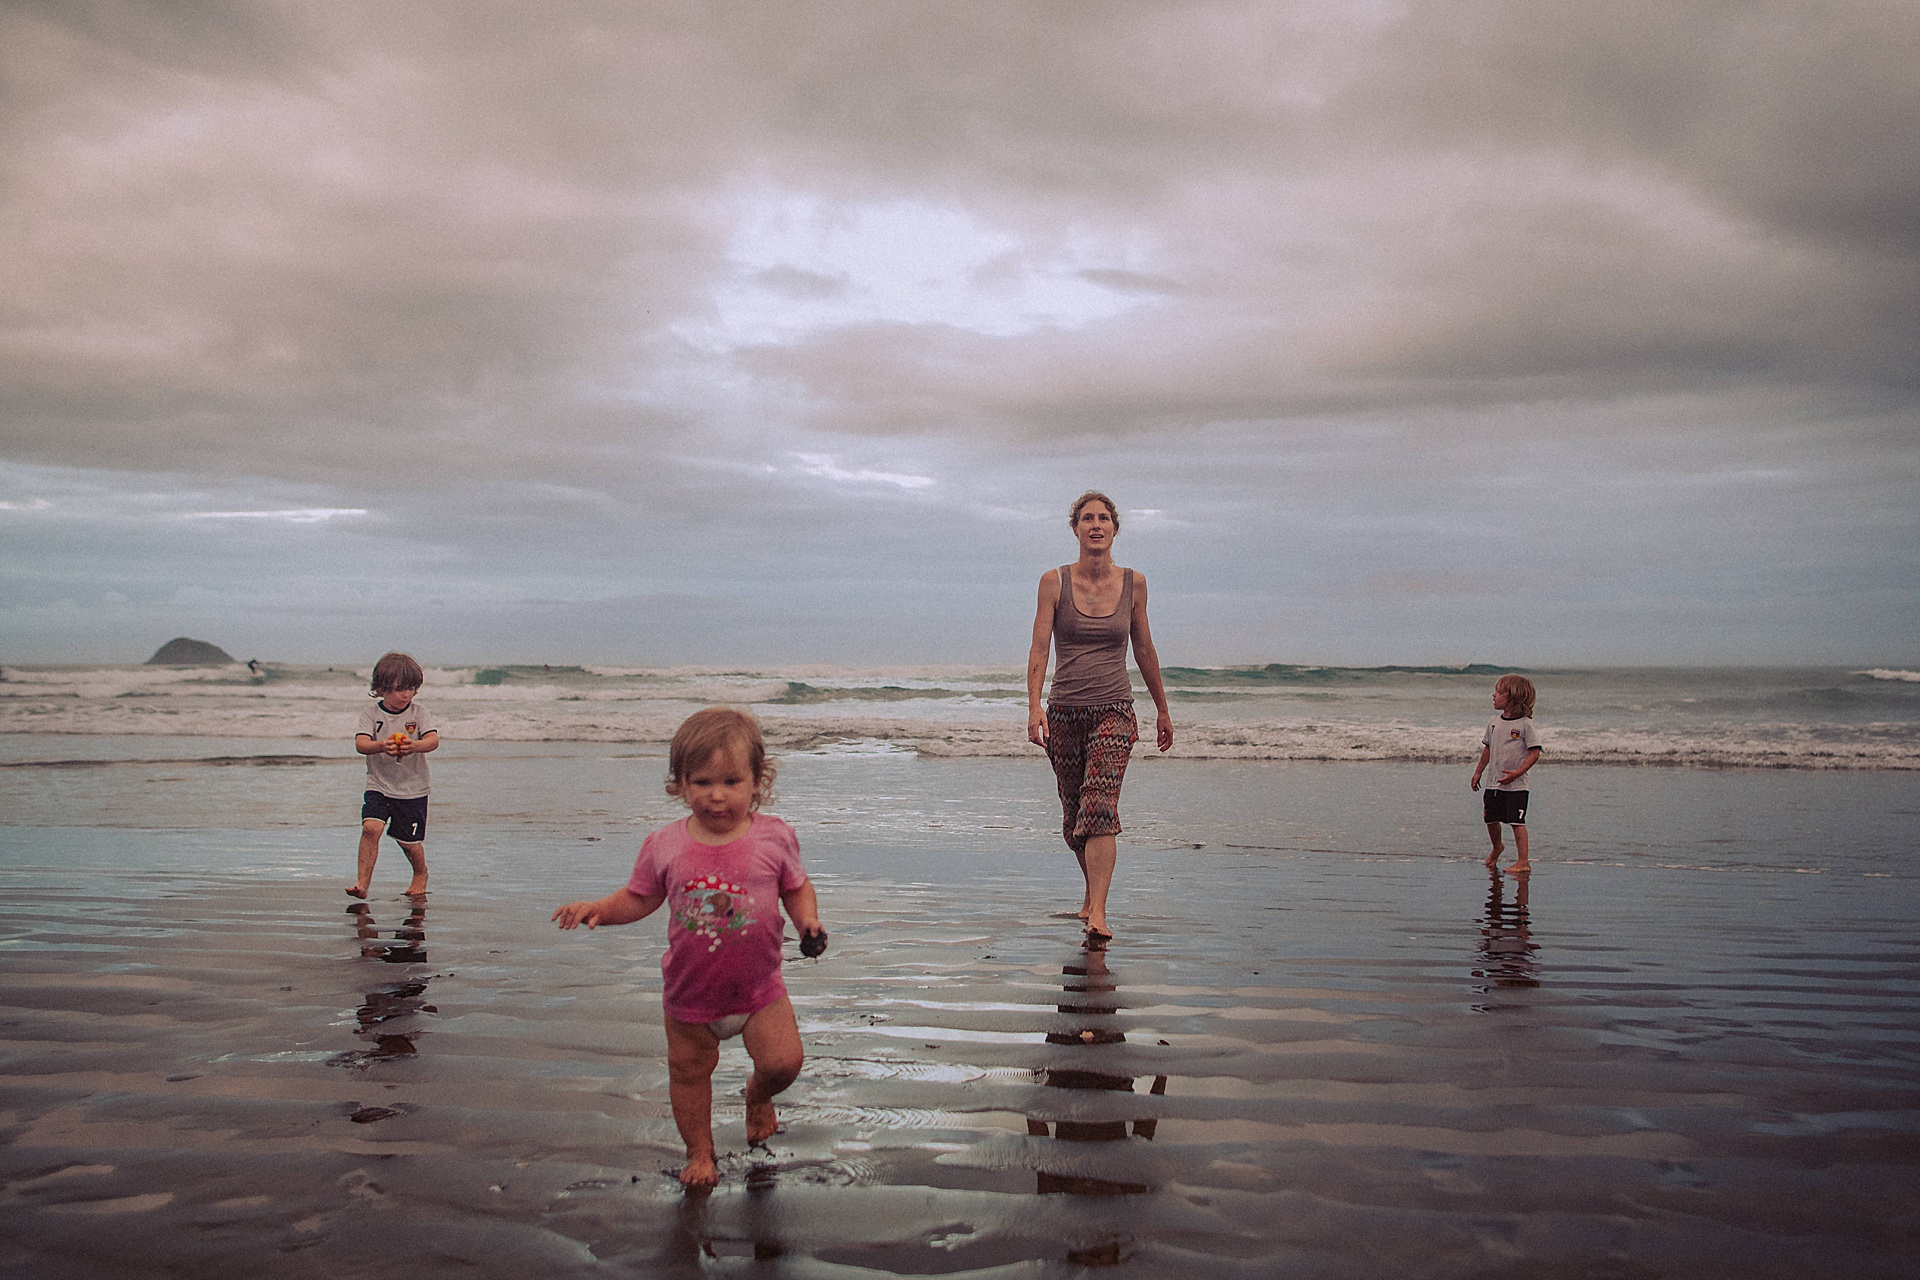 family-roadtrip-neuseeland-travelnewzealand-danielzube_0711.jpg